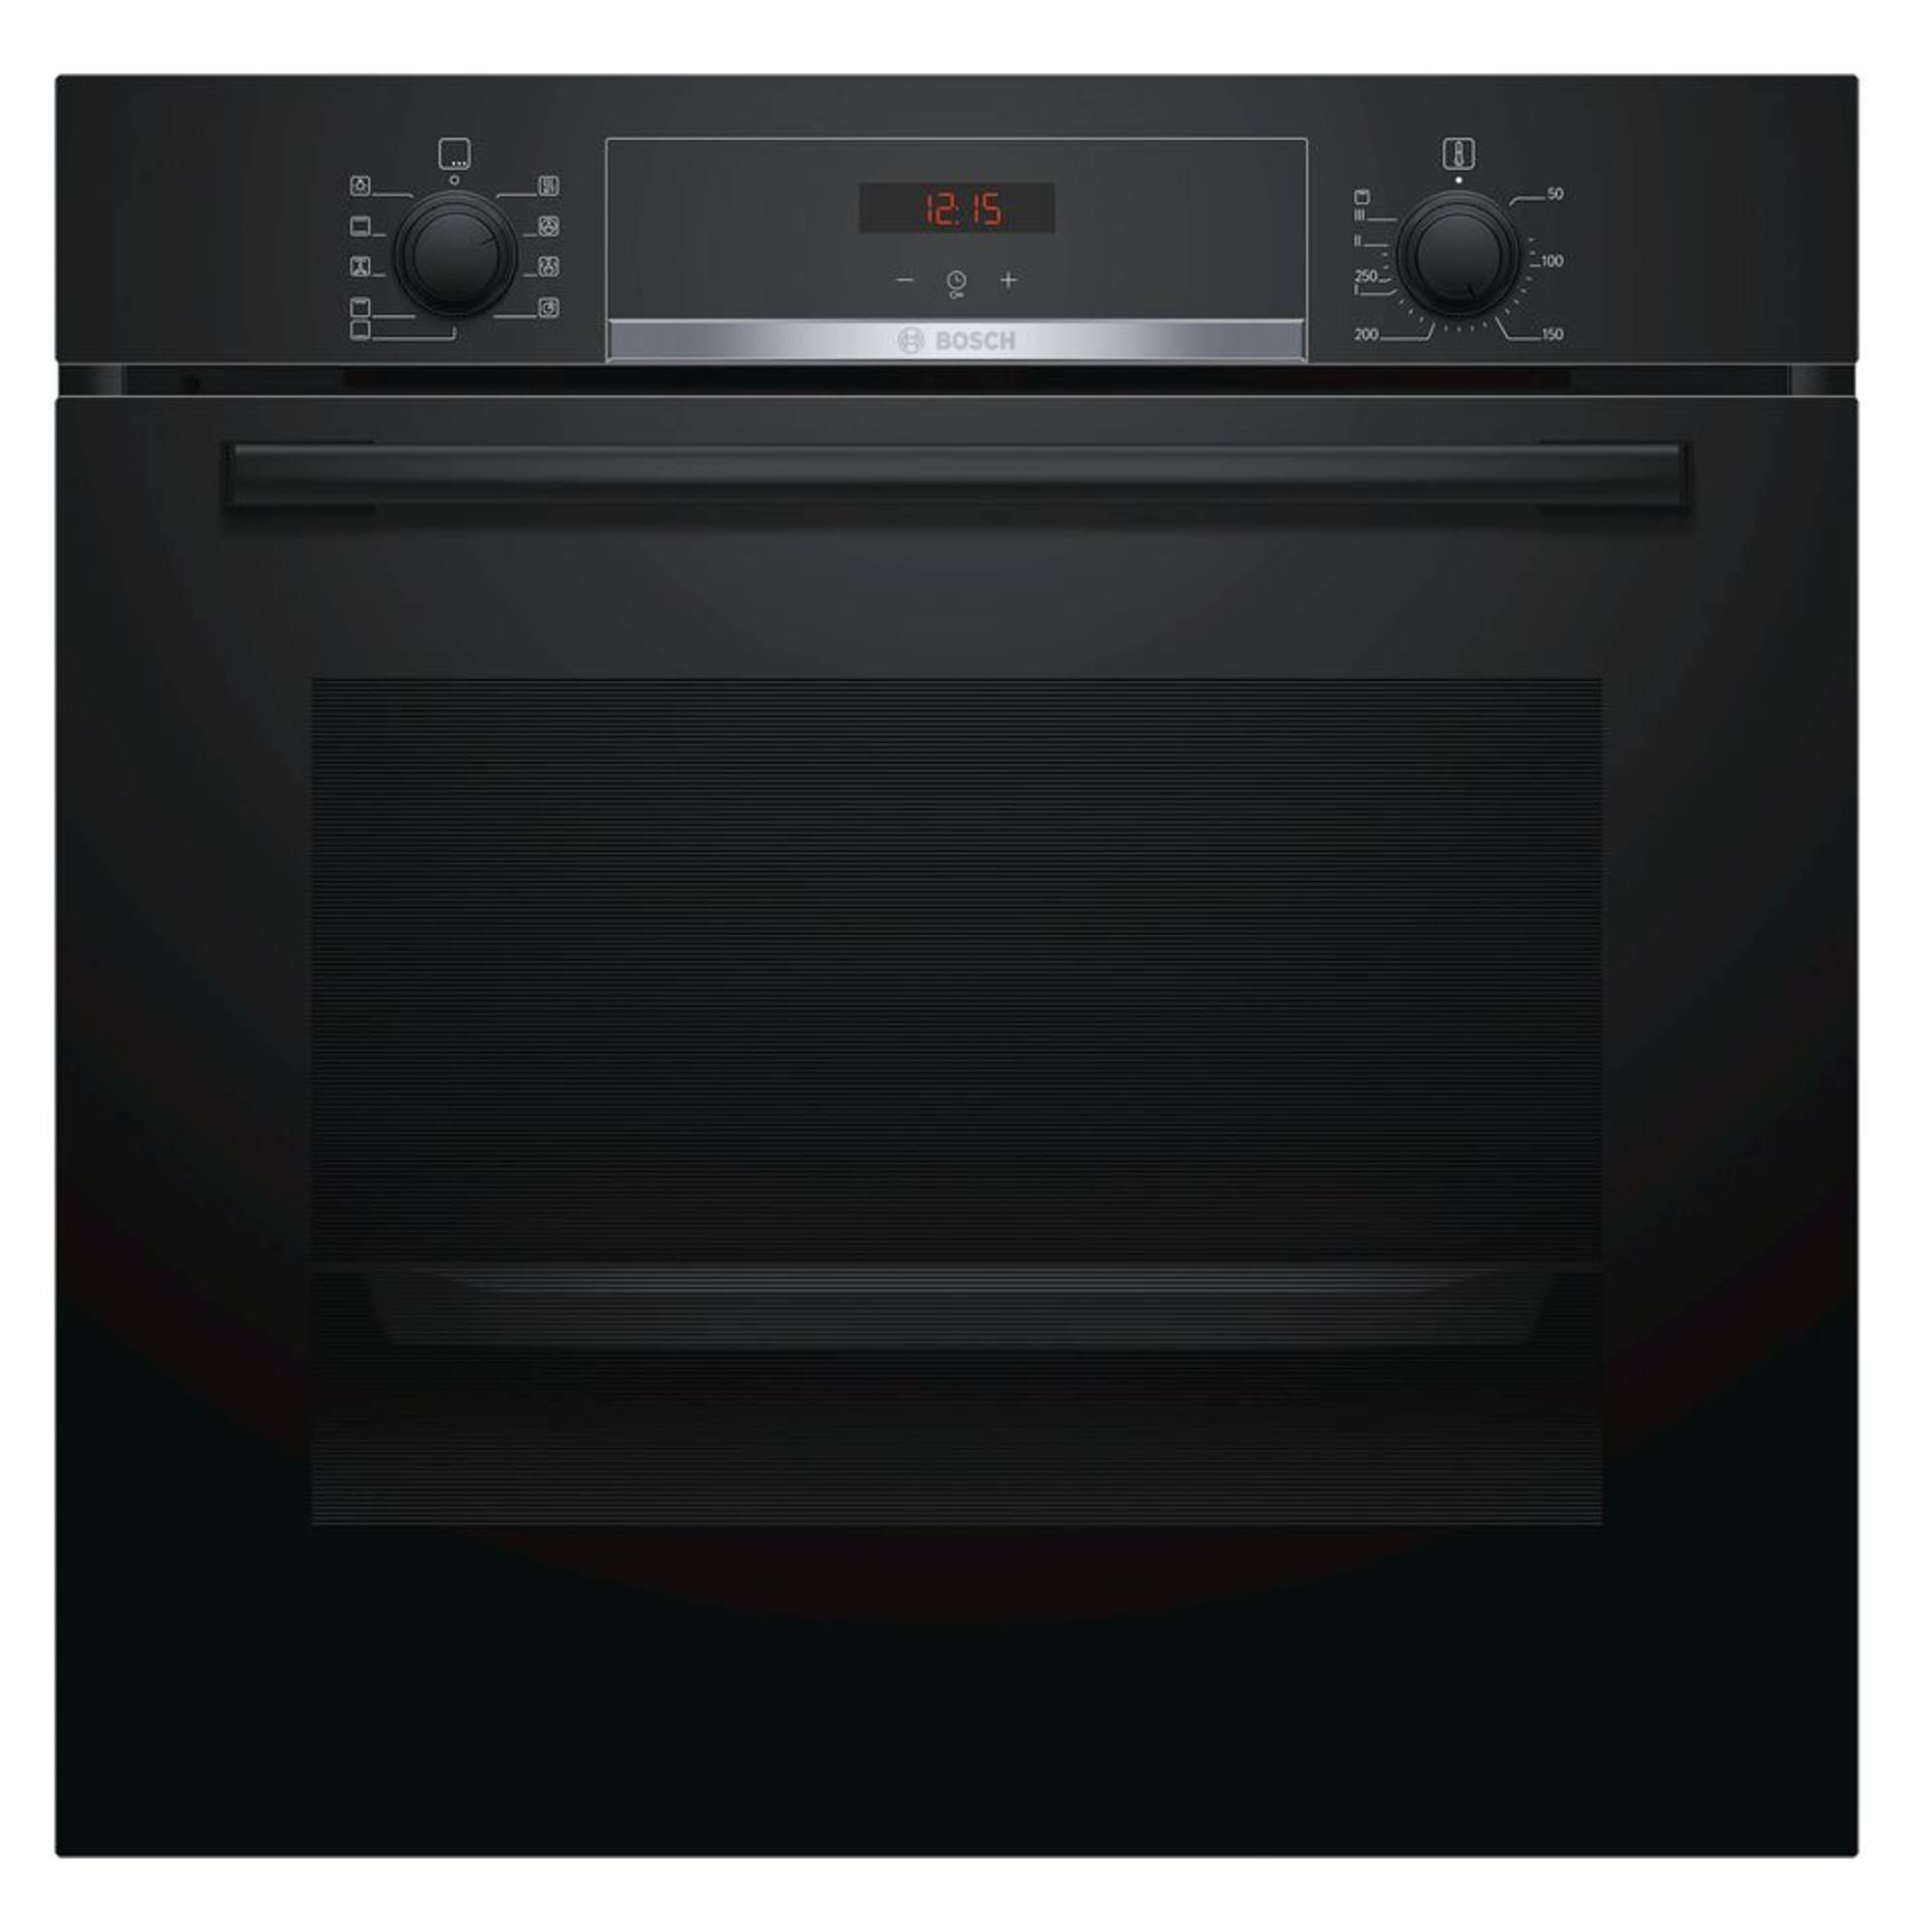 Bosch Hbs534bb0b 594mm Electric 71l Single Oven Black